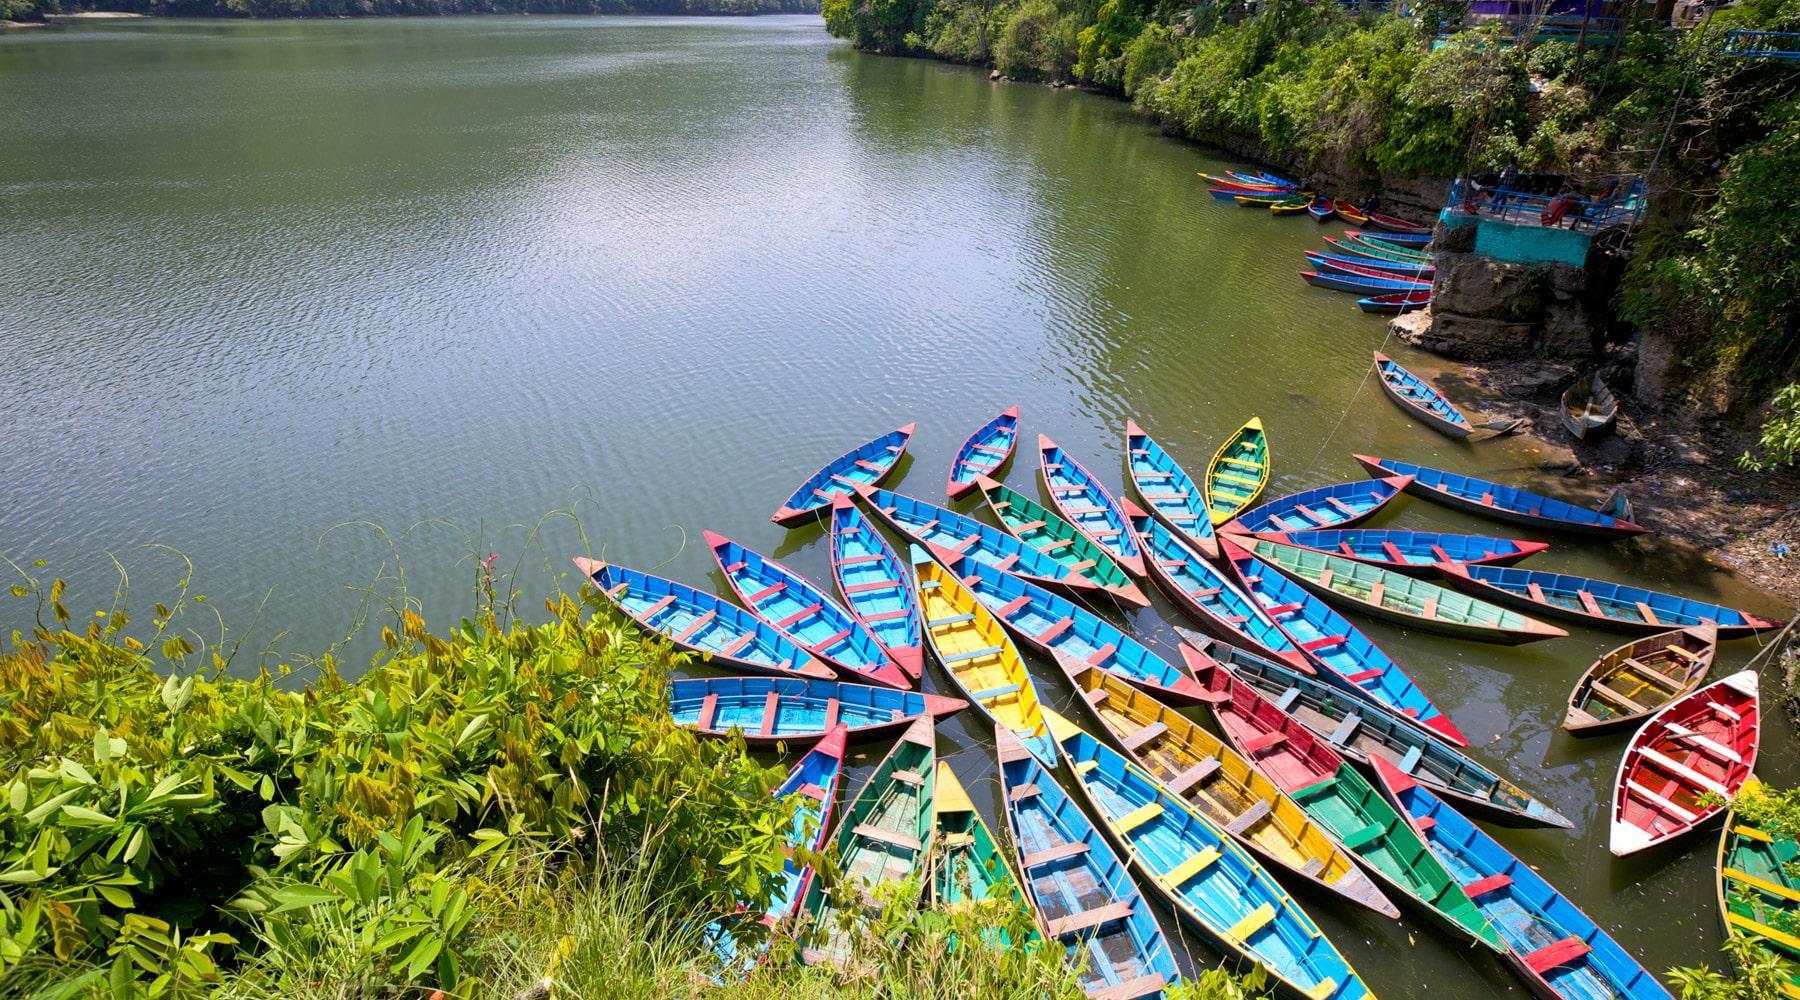 Phewa Lake – The Gorgeous Lake in Pokhara, Nepal